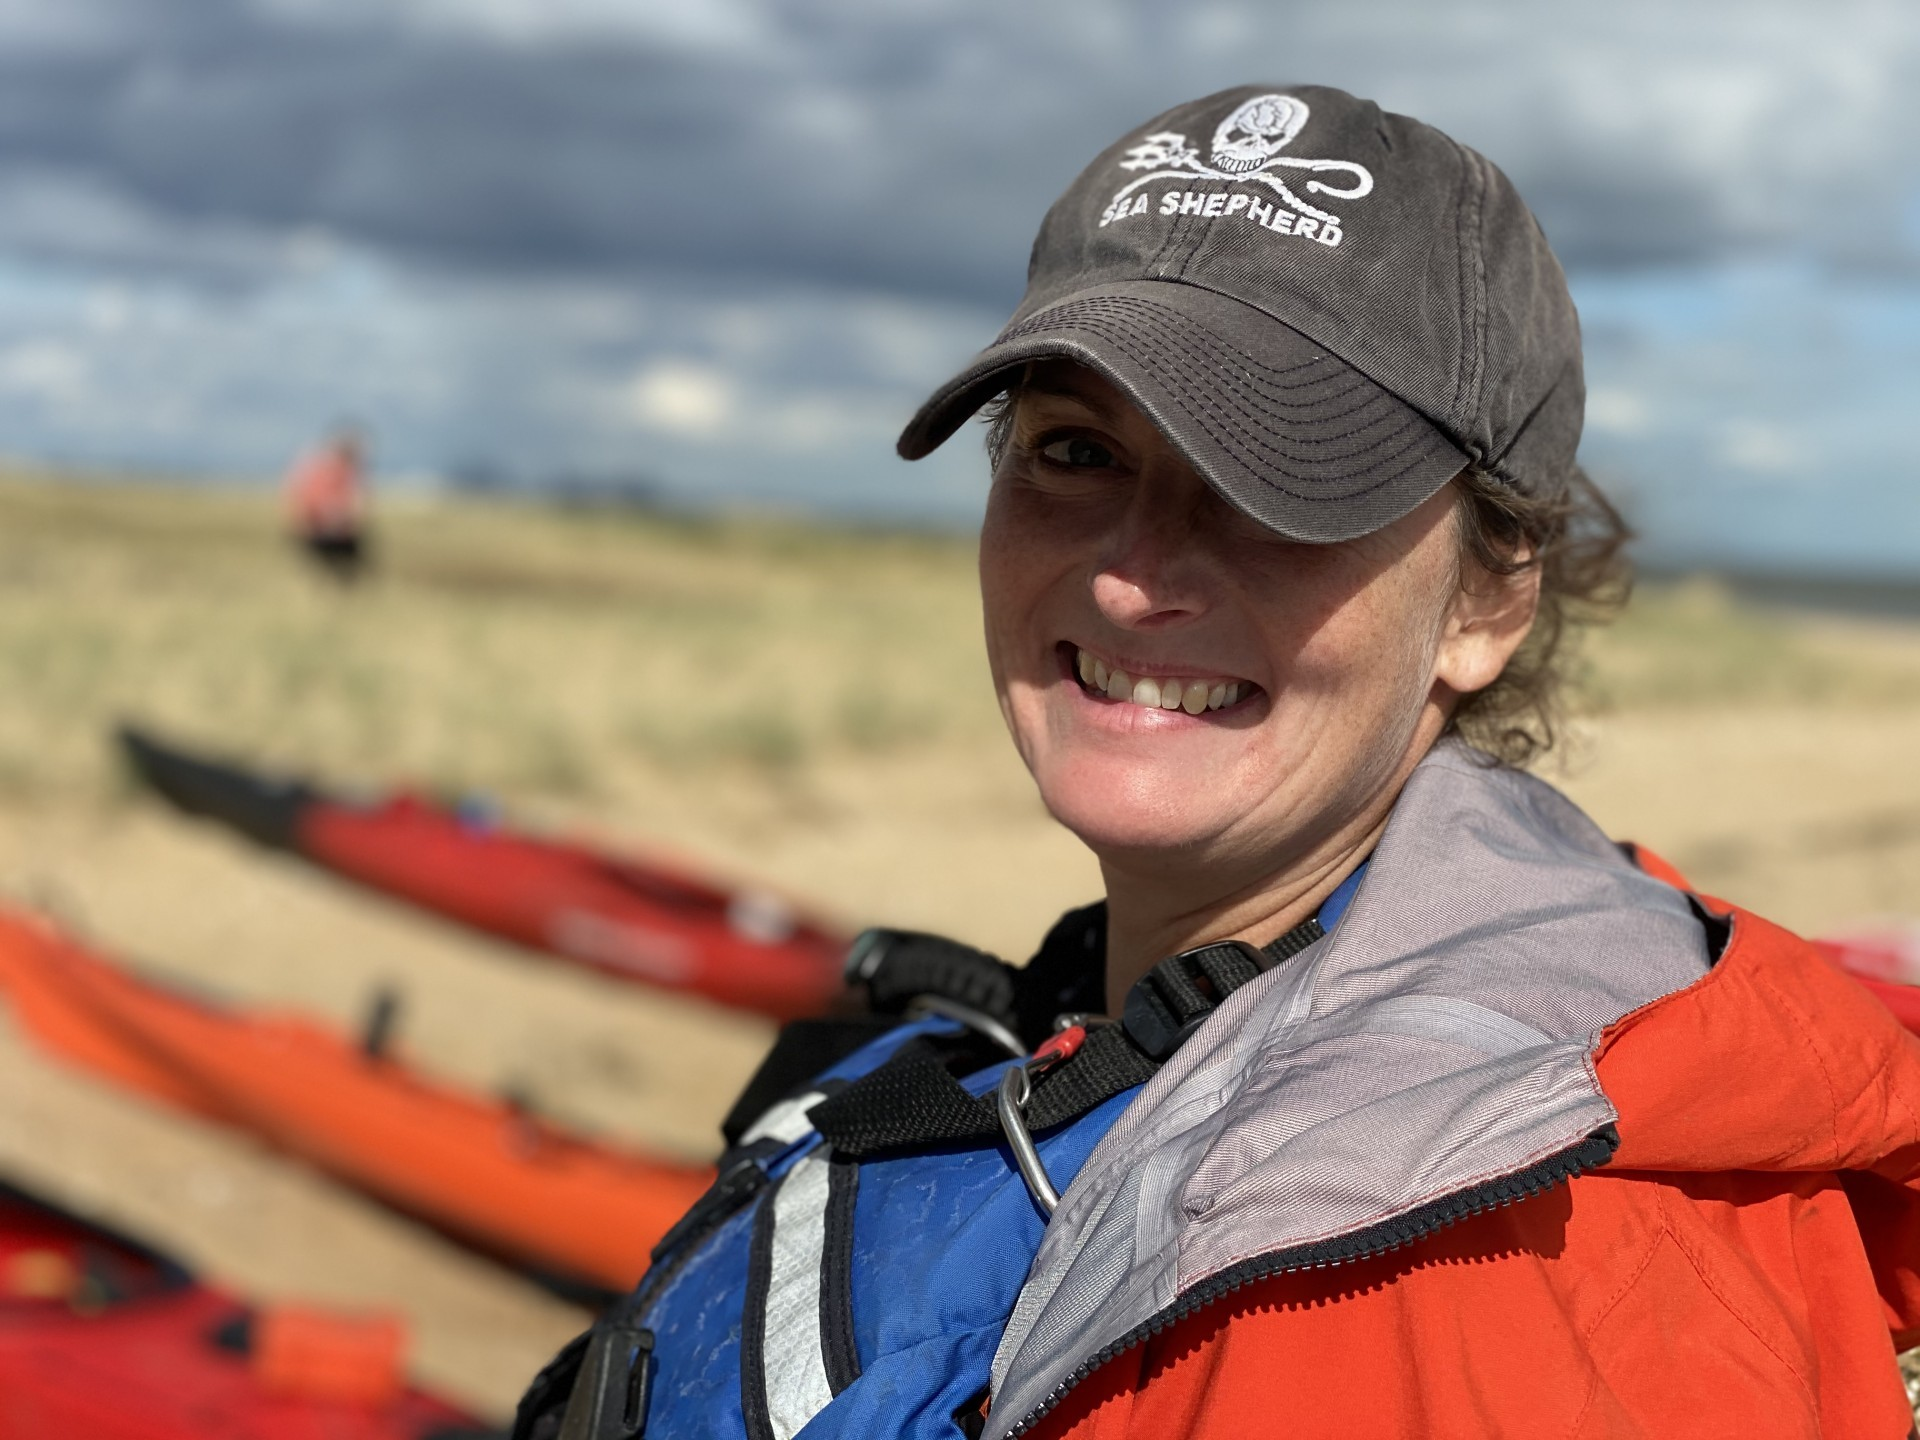 NOMAD Sea Kayaking guide Sea Shepherd.